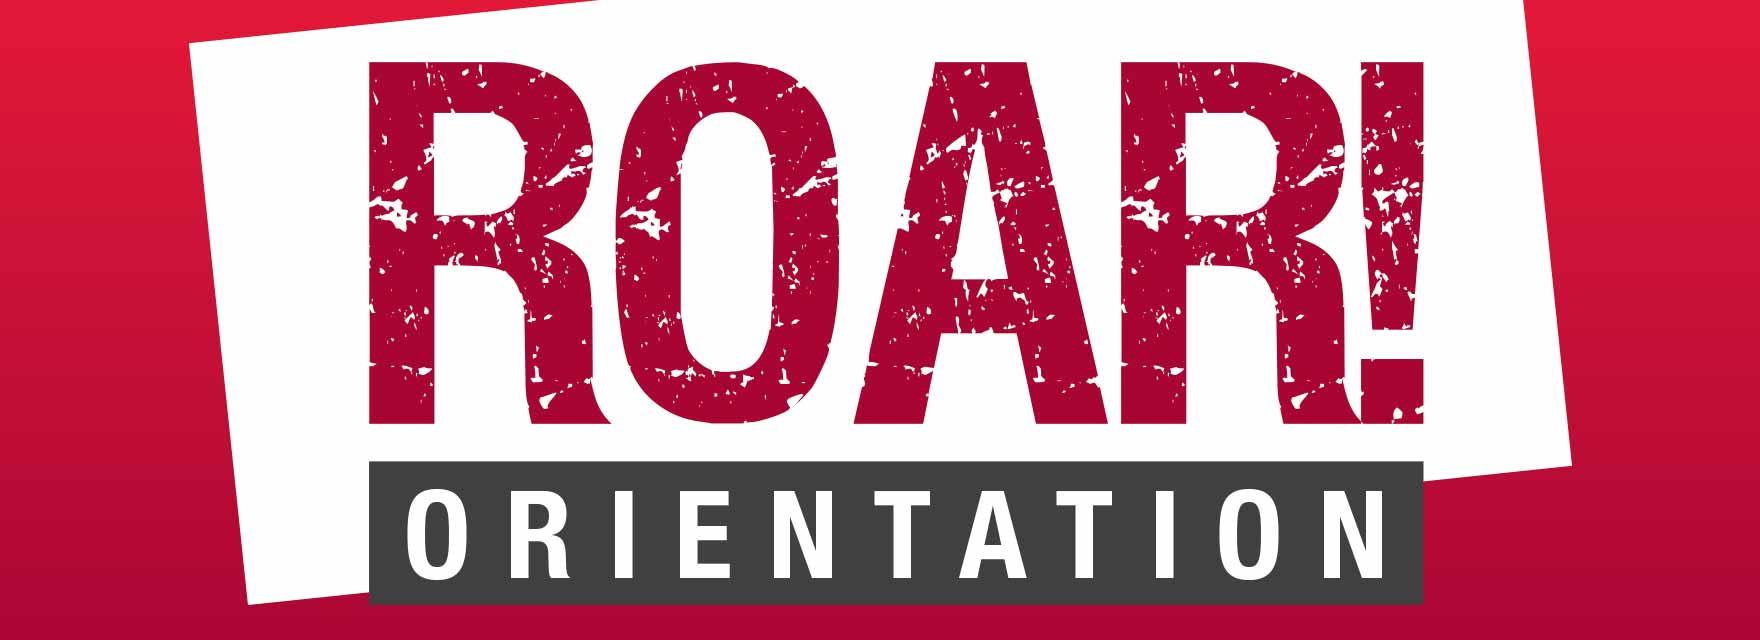 ROAR Orientation - Orientation - WSU Vancouver